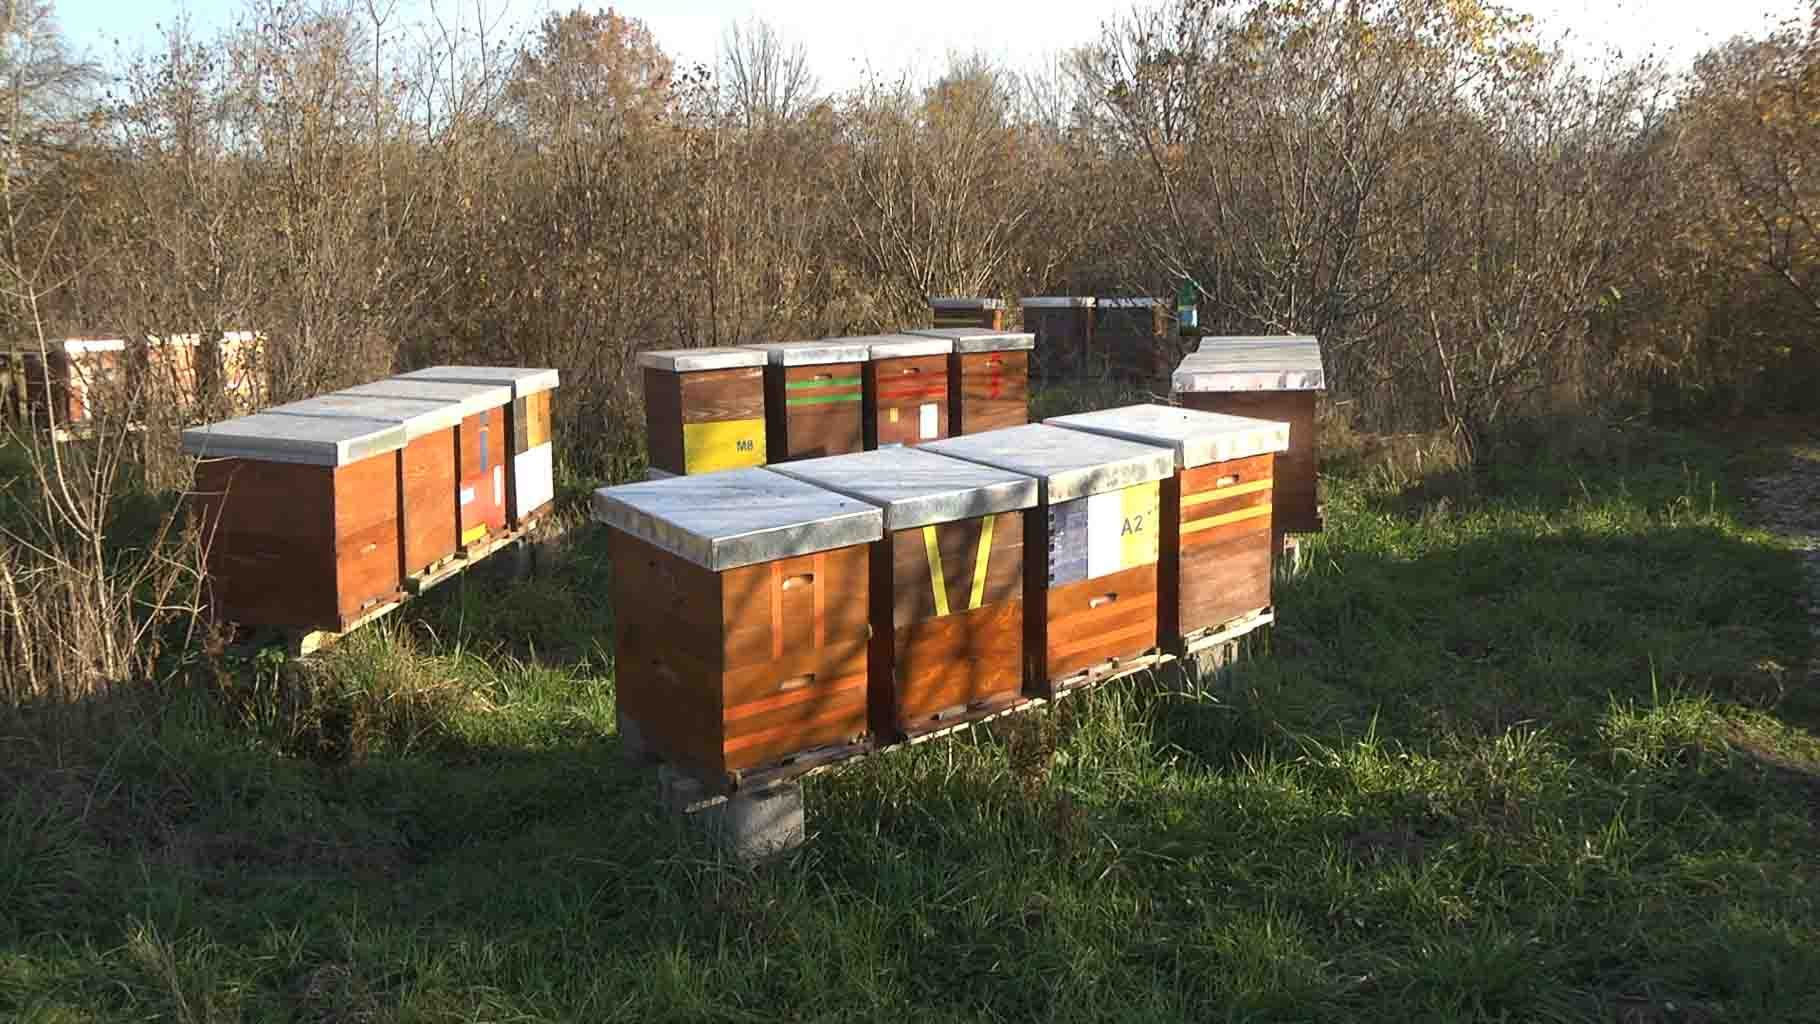 Pčelari košnice